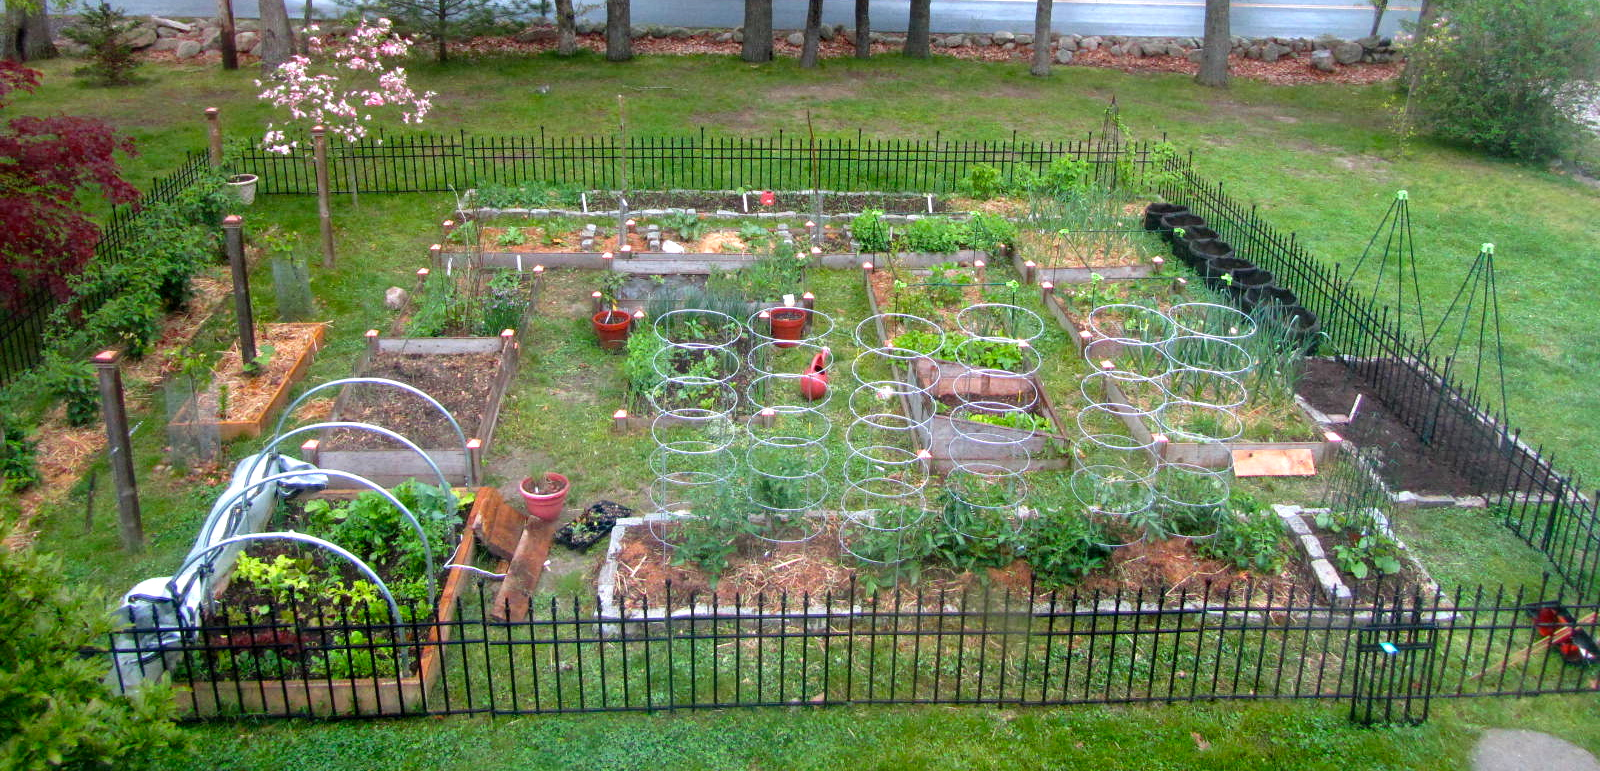 How my garden grows garden plans for Large vegetable garden